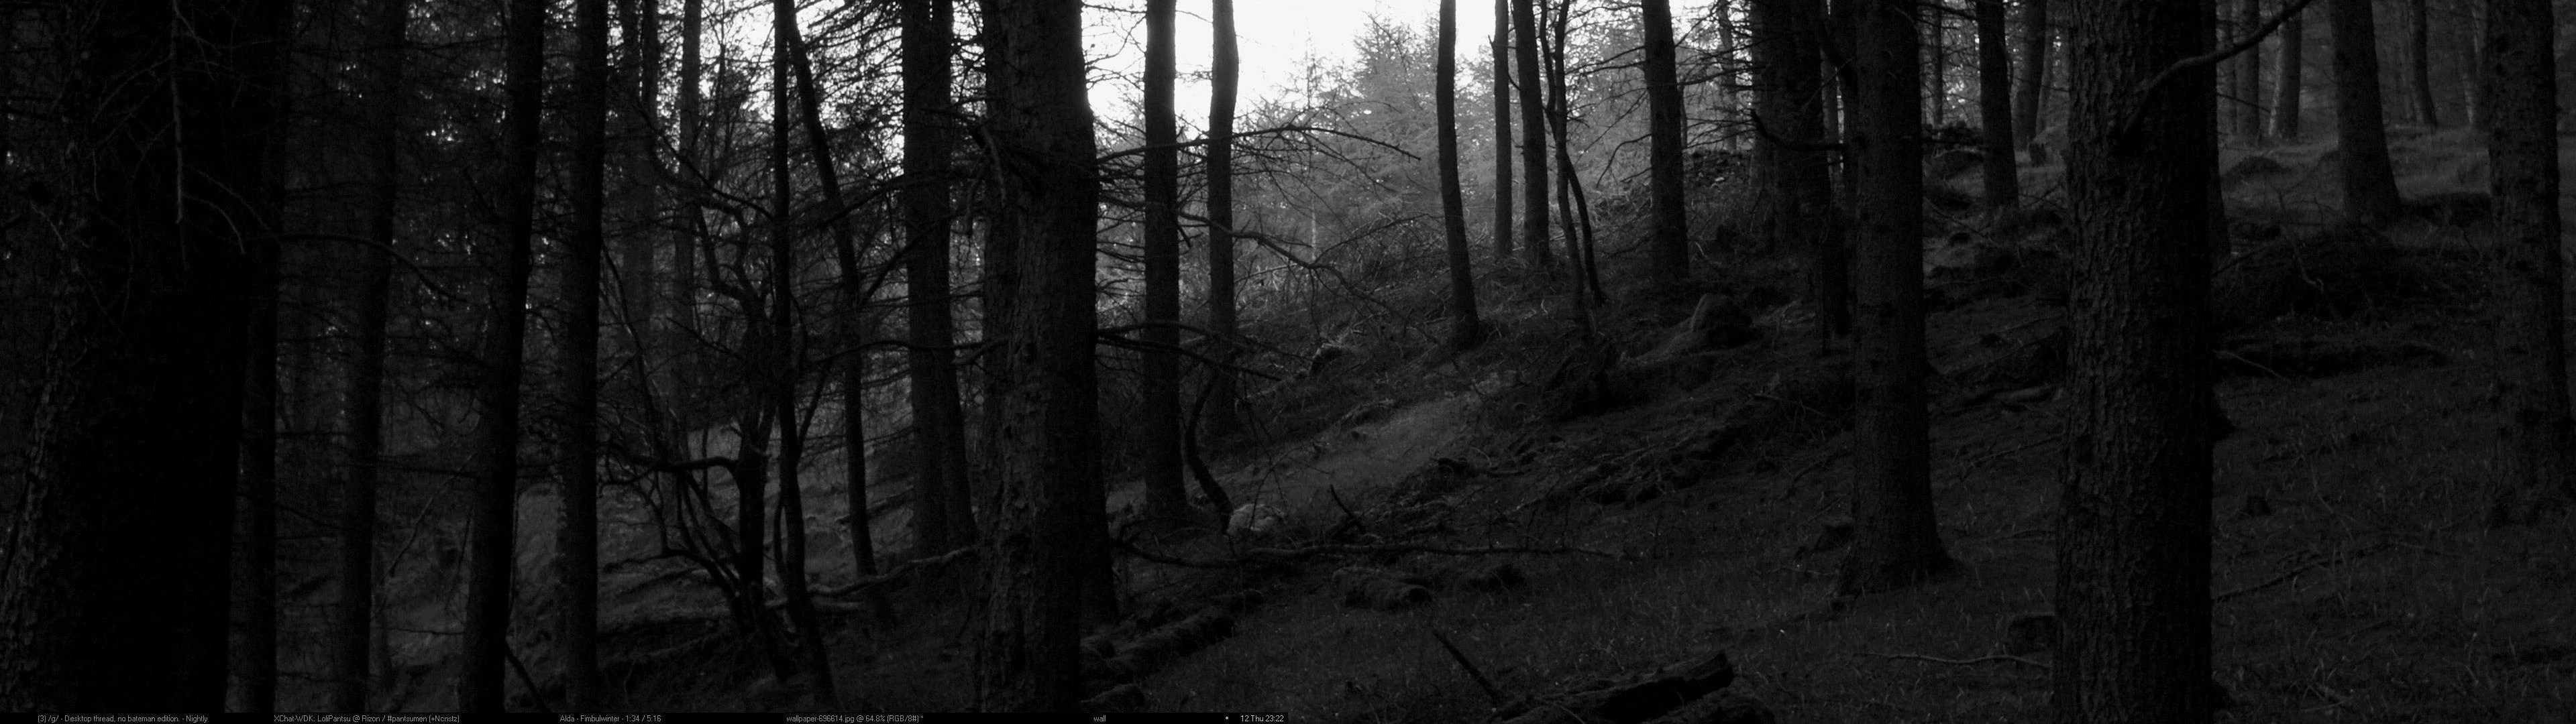 Dark Fall Iphone Wallpaper Black Forest Wallpapers Wallpaper Cave